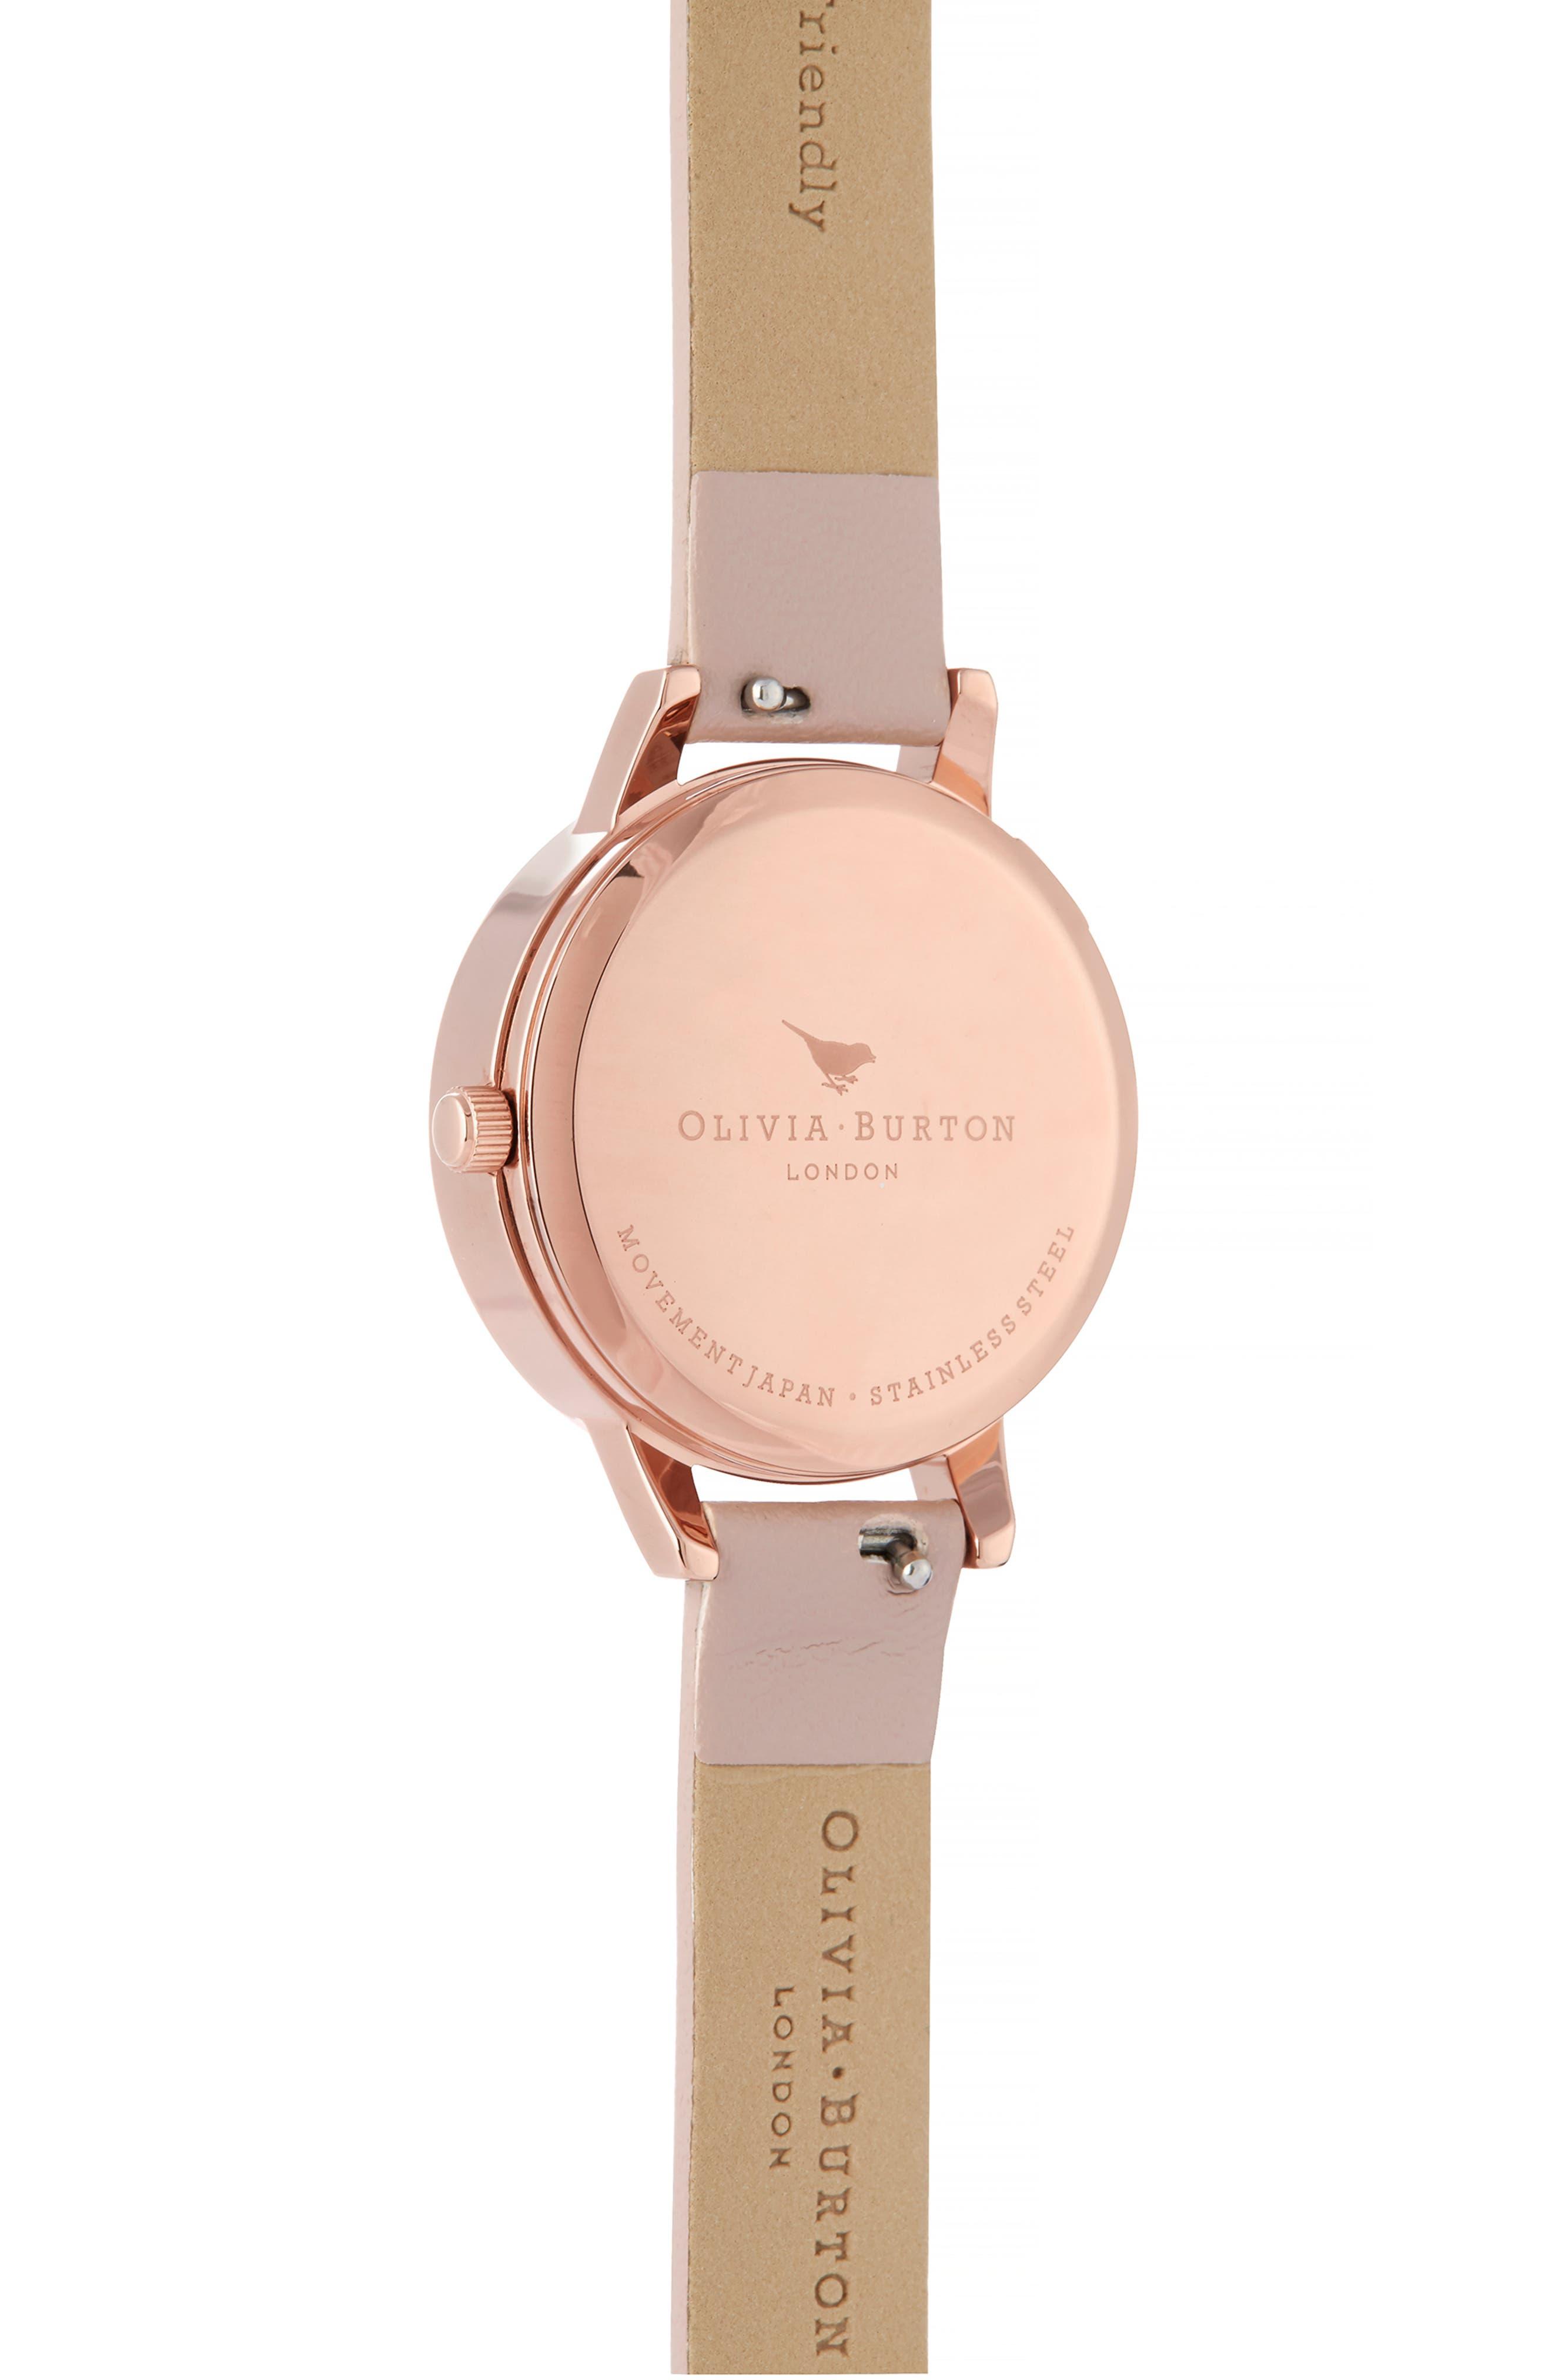 OLIVIA BURTON,                             Wishing Leather Strap Watch, 35mm,                             Alternate thumbnail 2, color,                             ROSE SAND/SILVER FLOR/ROSEGOLD